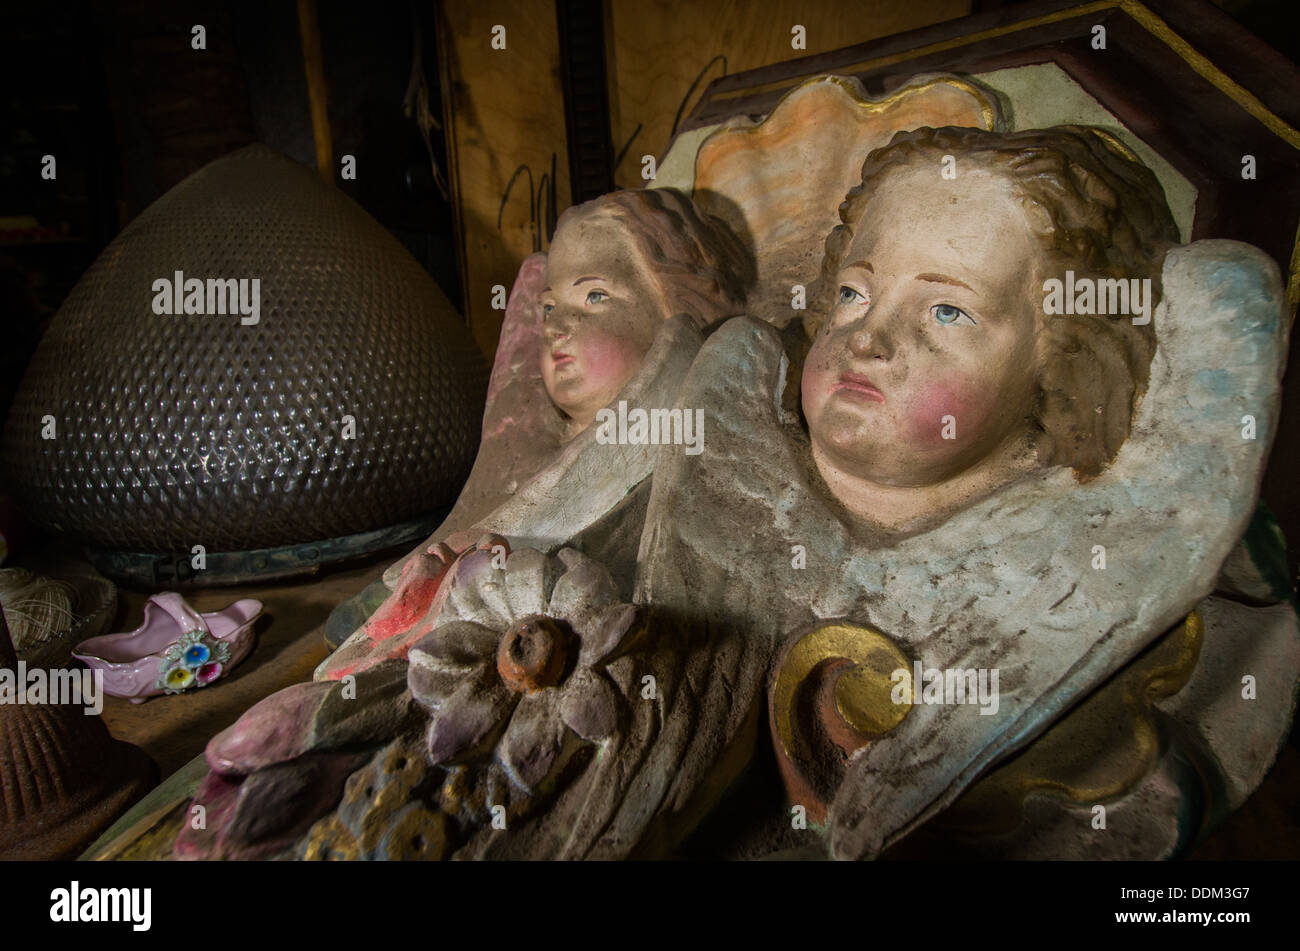 Dirty and sooty cherub statuary lies on a shelf amongst other bric-a-brac. - Stock Image